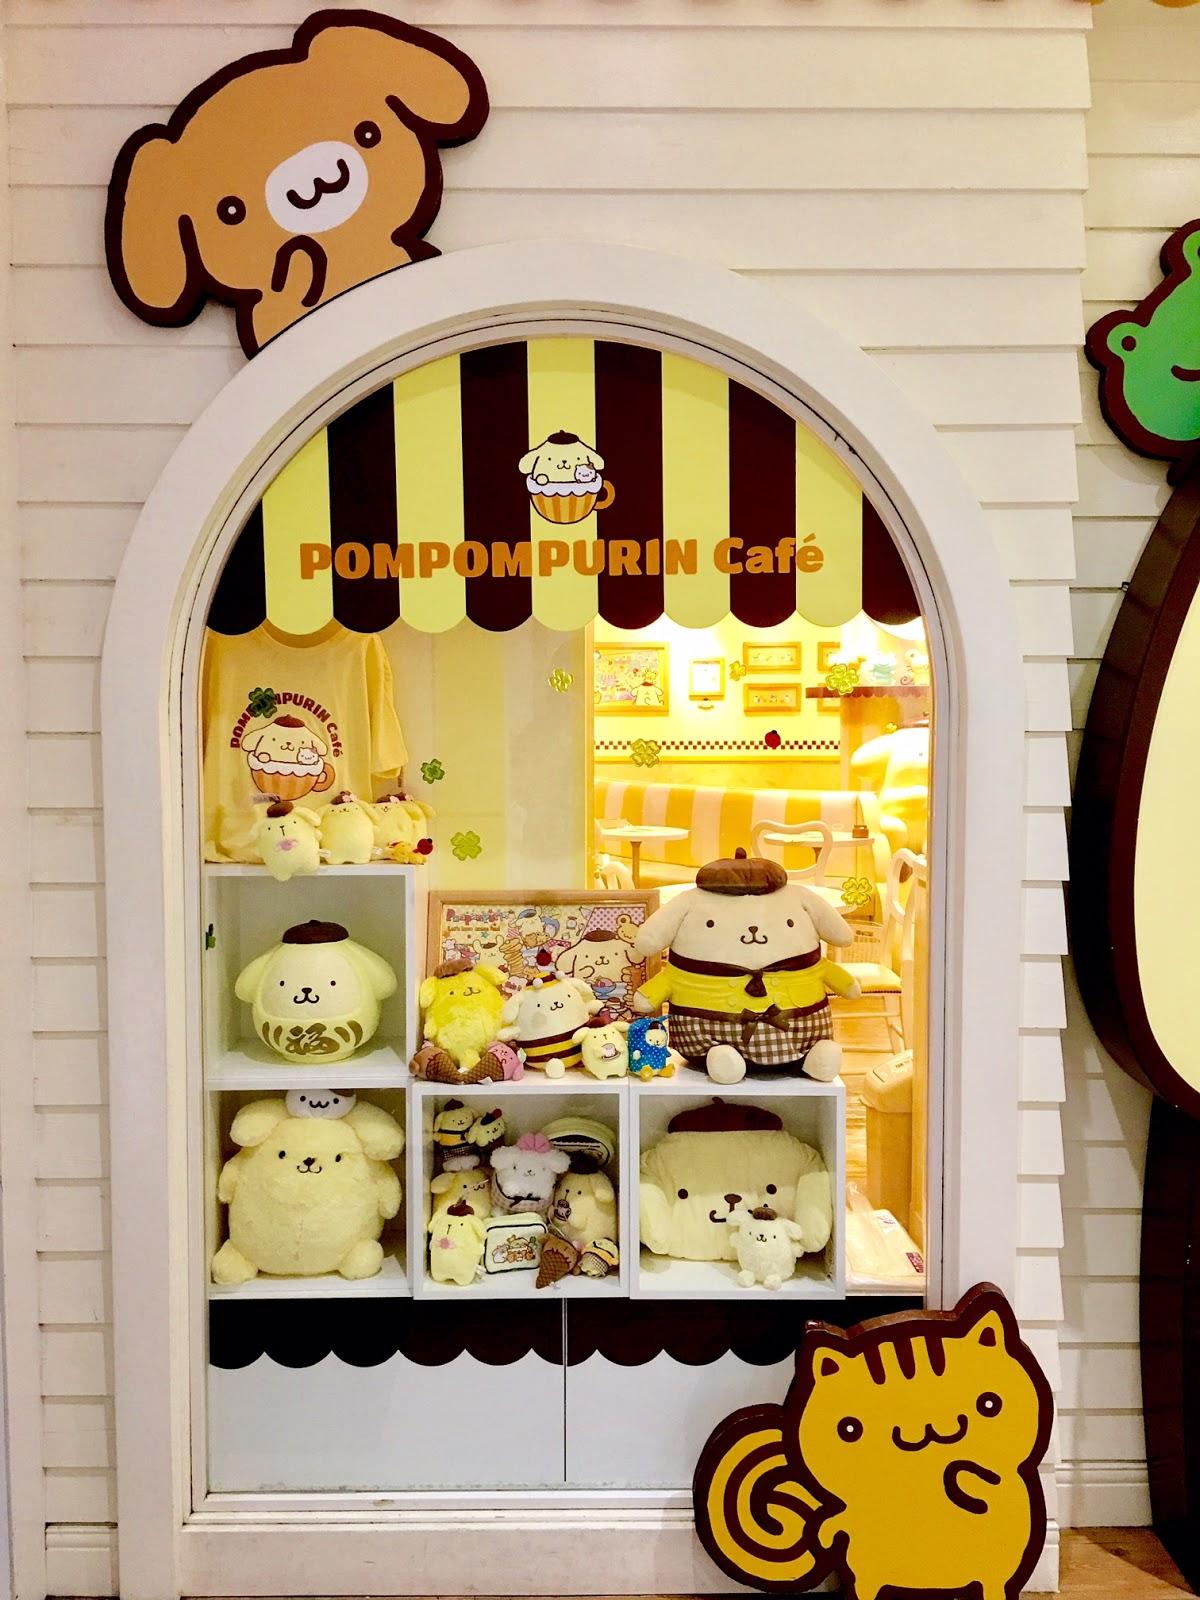 Pompompurin Cafe Japan